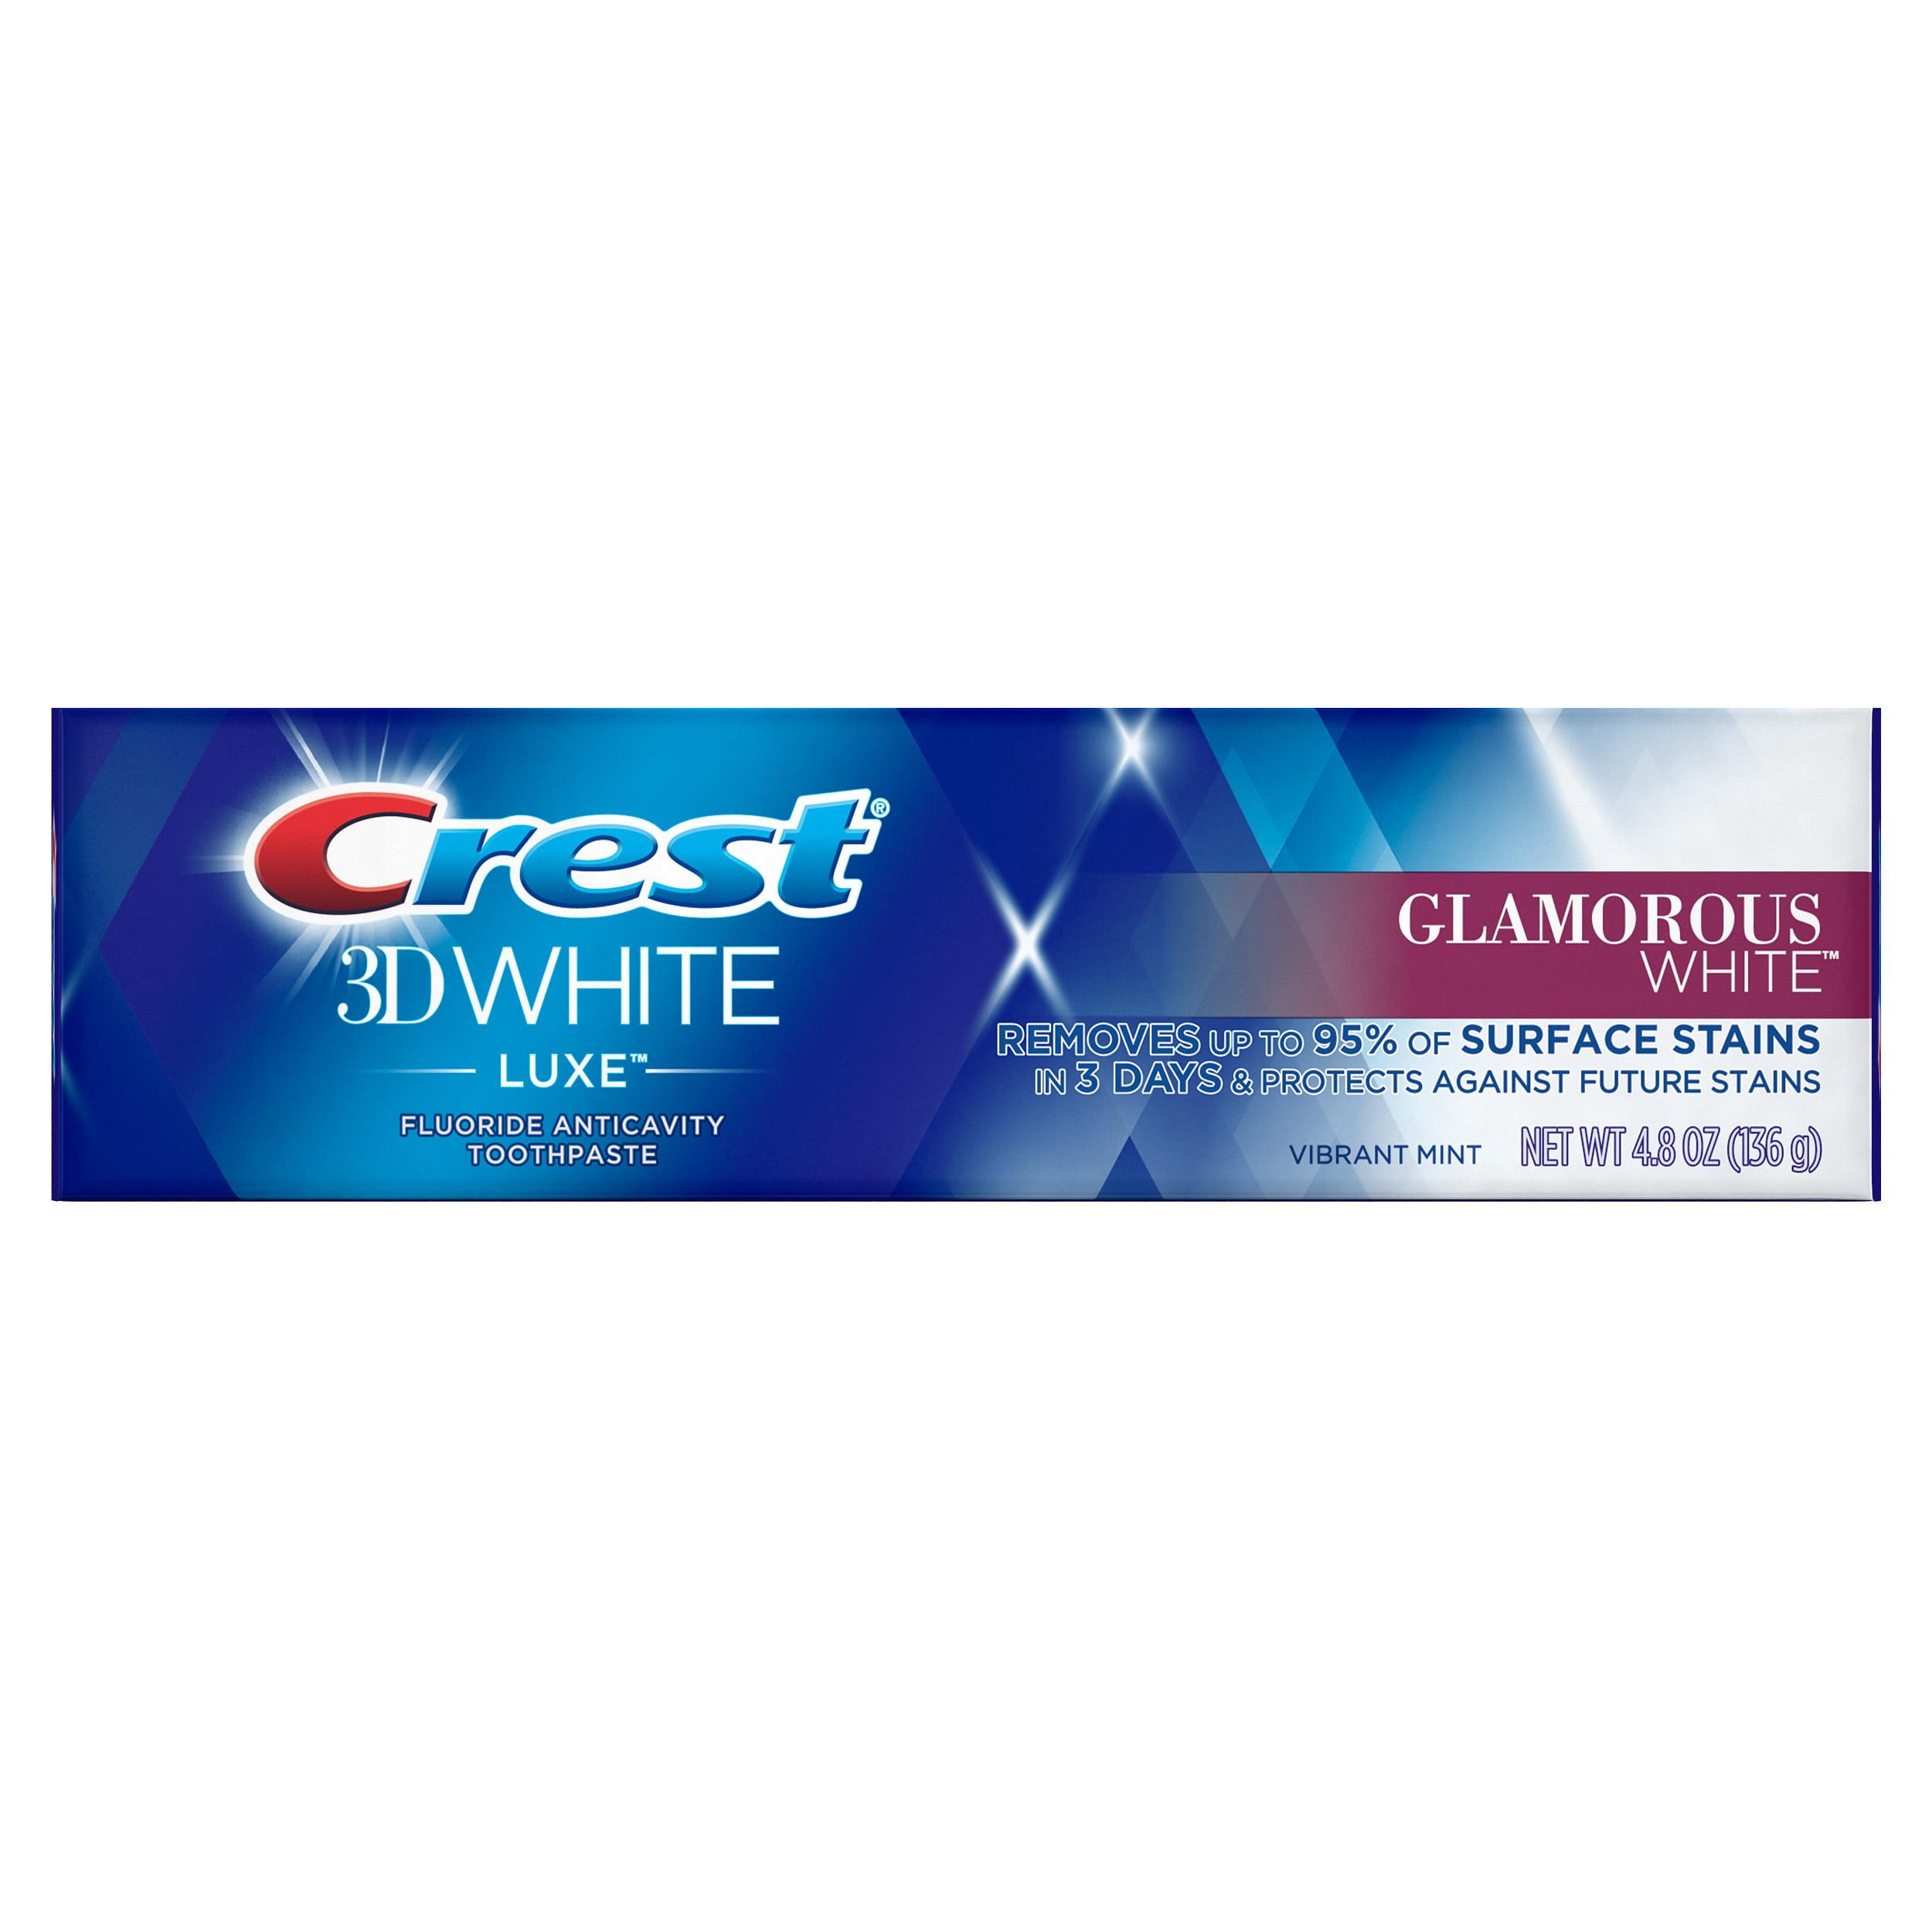 Crest 3d White Luxe Glamorous White Whitening Toothpaste Vibrant